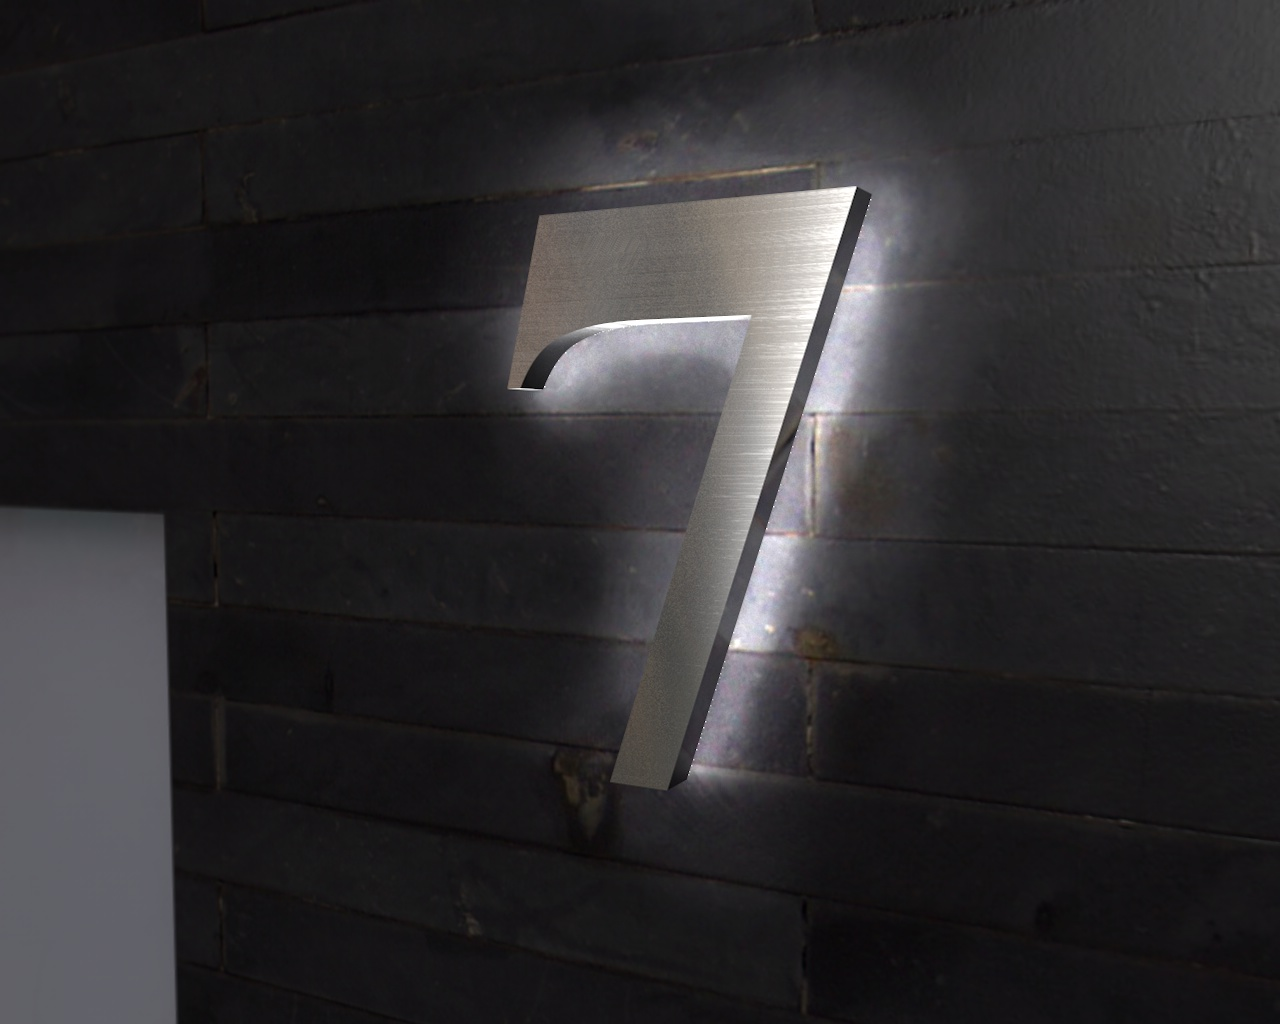 edelstahl hausnummer beleuchtete led edelstahl hausnummer 7. Black Bedroom Furniture Sets. Home Design Ideas